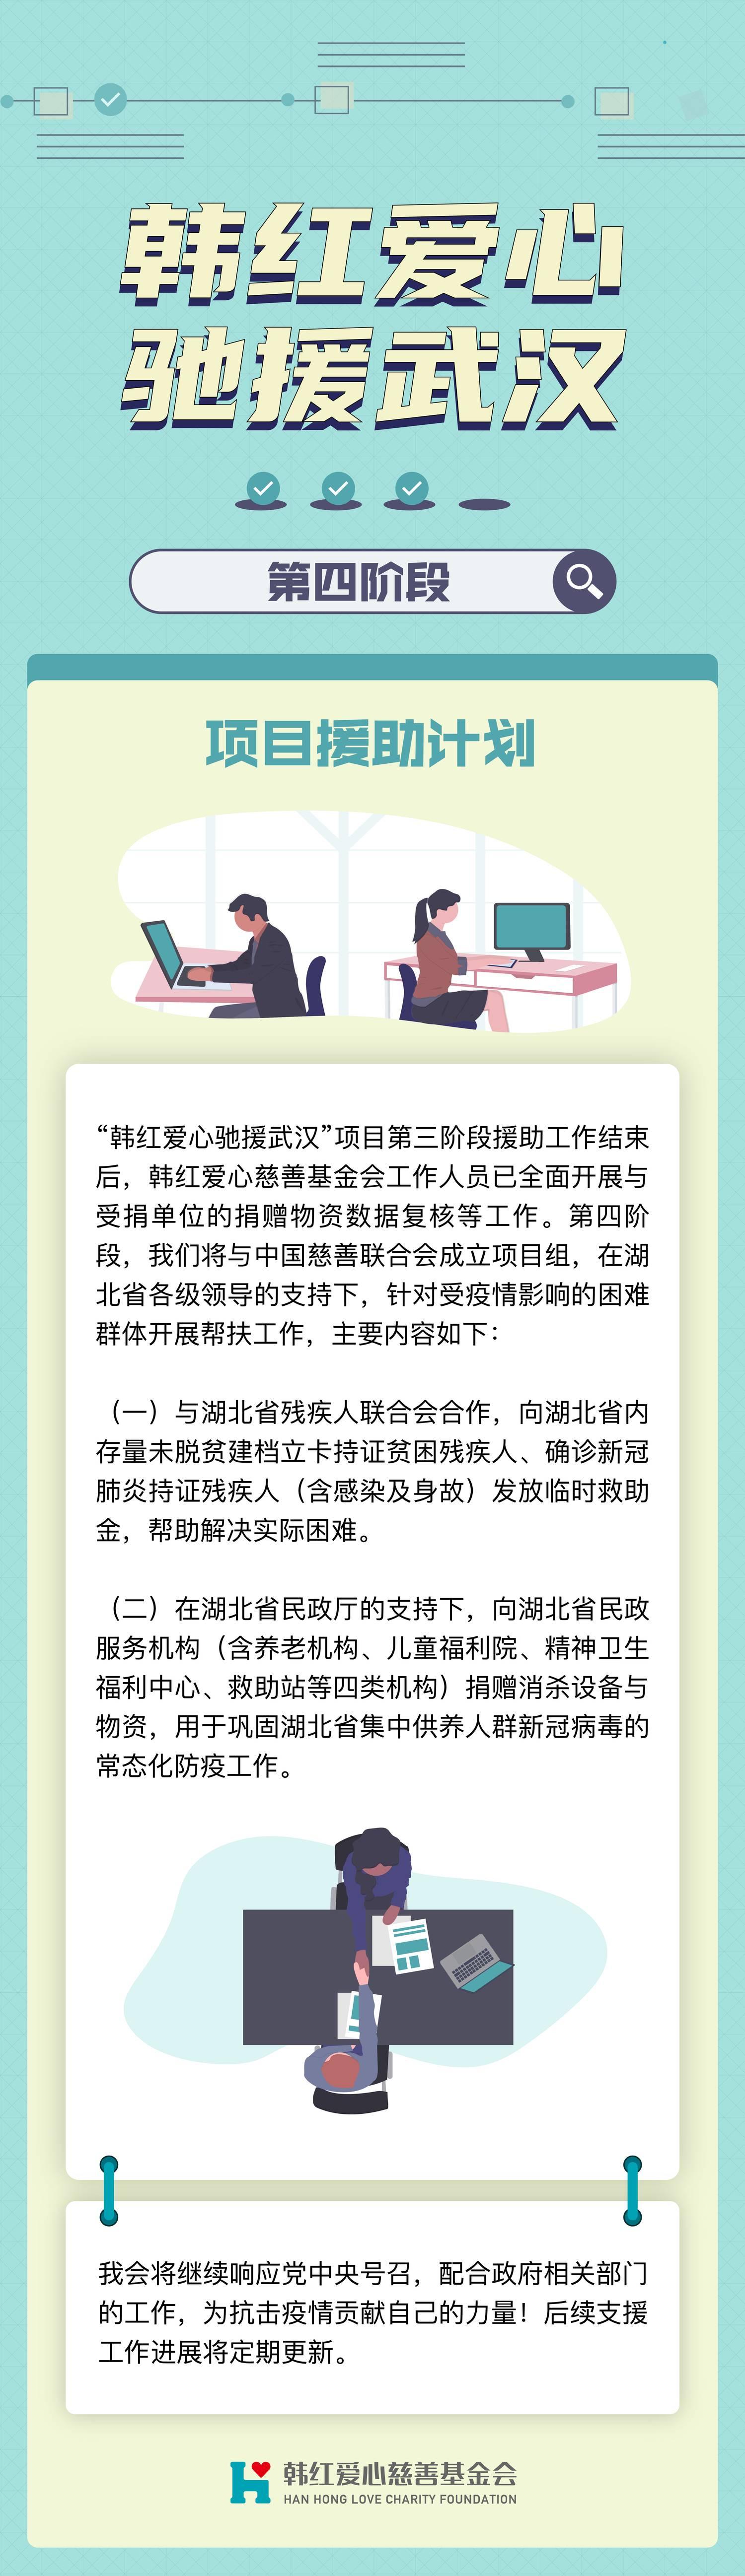 长图官网.png